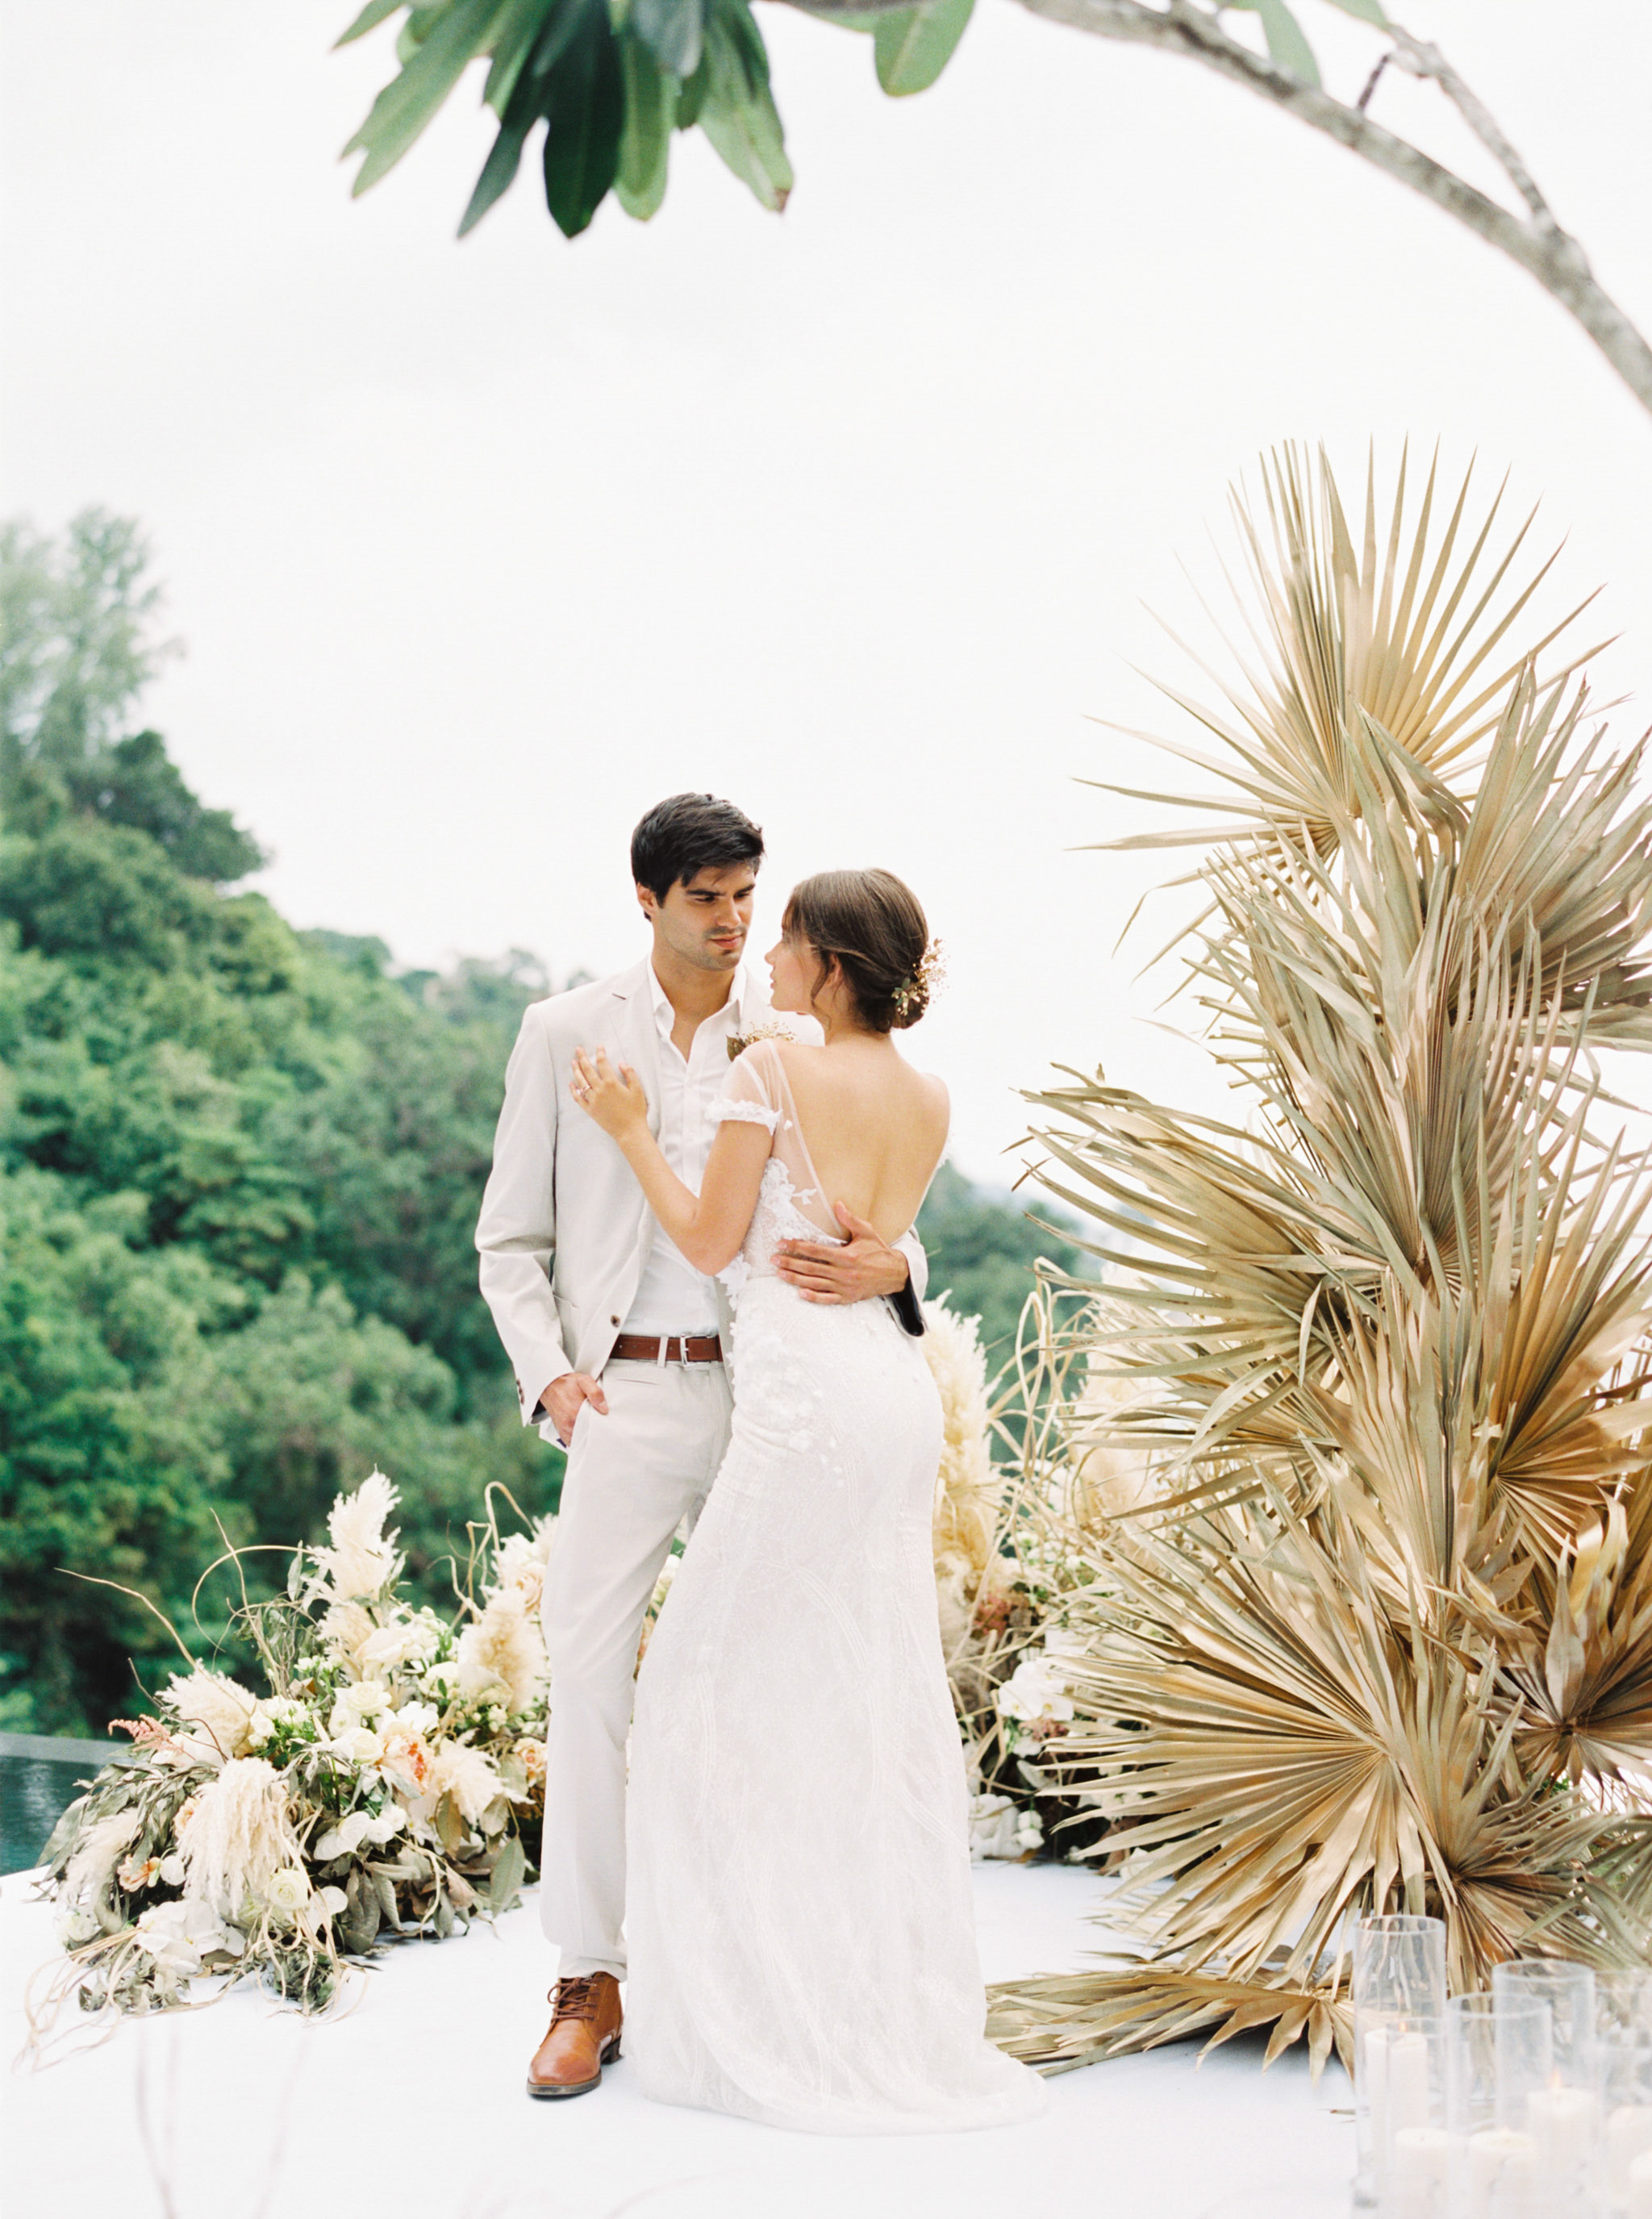 Destination Wedding at The Aquila Luxury Villas in Phuket Thailand Fine Art Film Wedding Photographer Sheri McMahon-00002-2.jpg